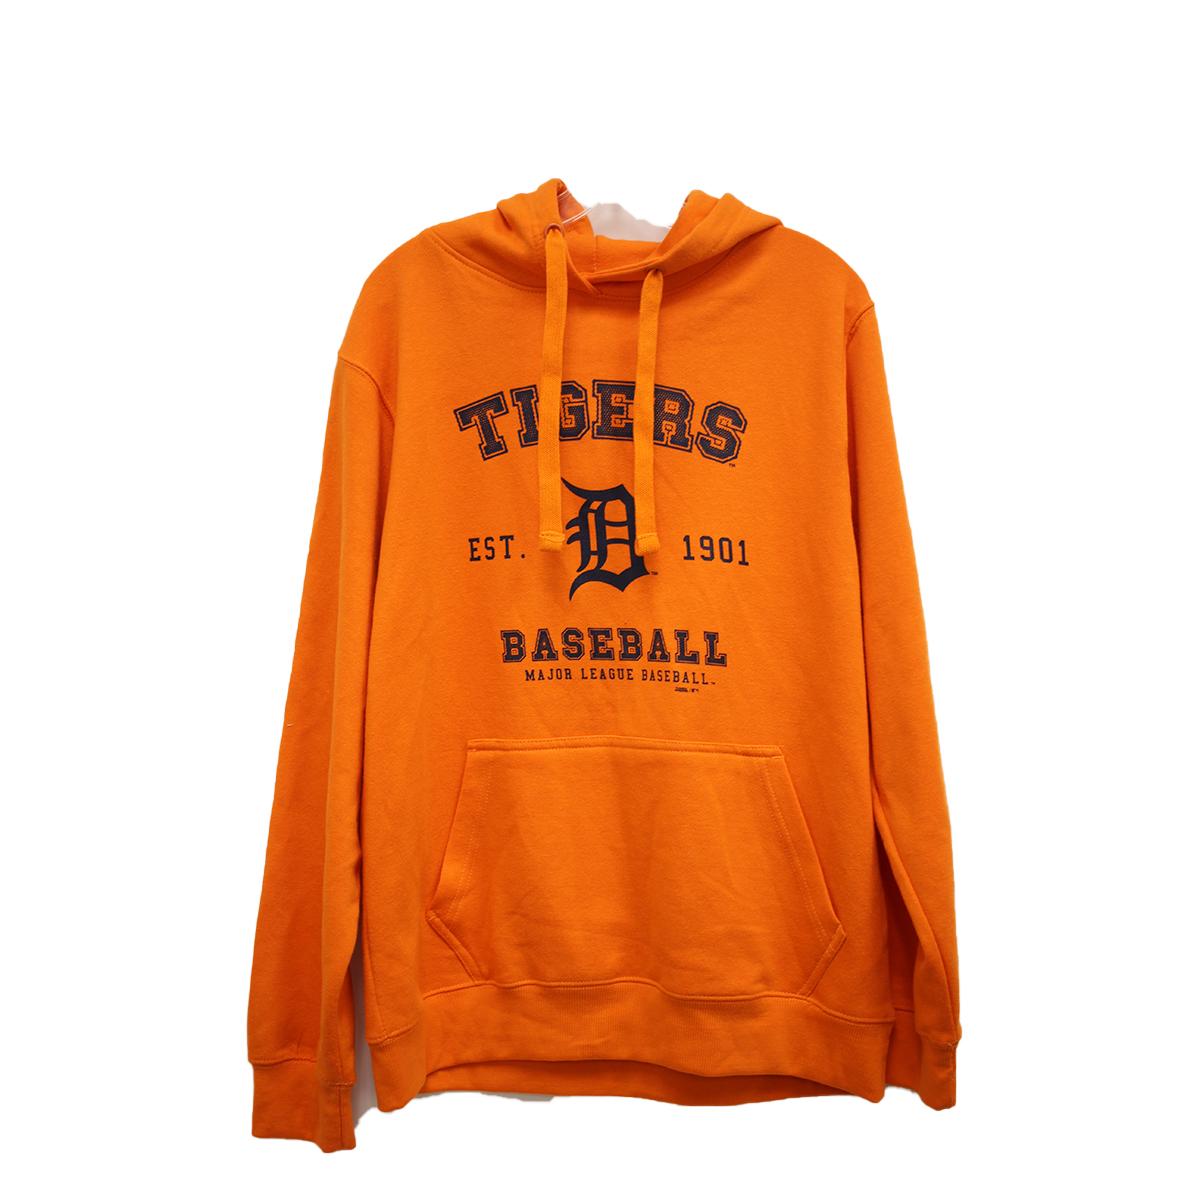 Men's Detroit Tigers Stitches Pull Over Hoodies, Orange, swatch